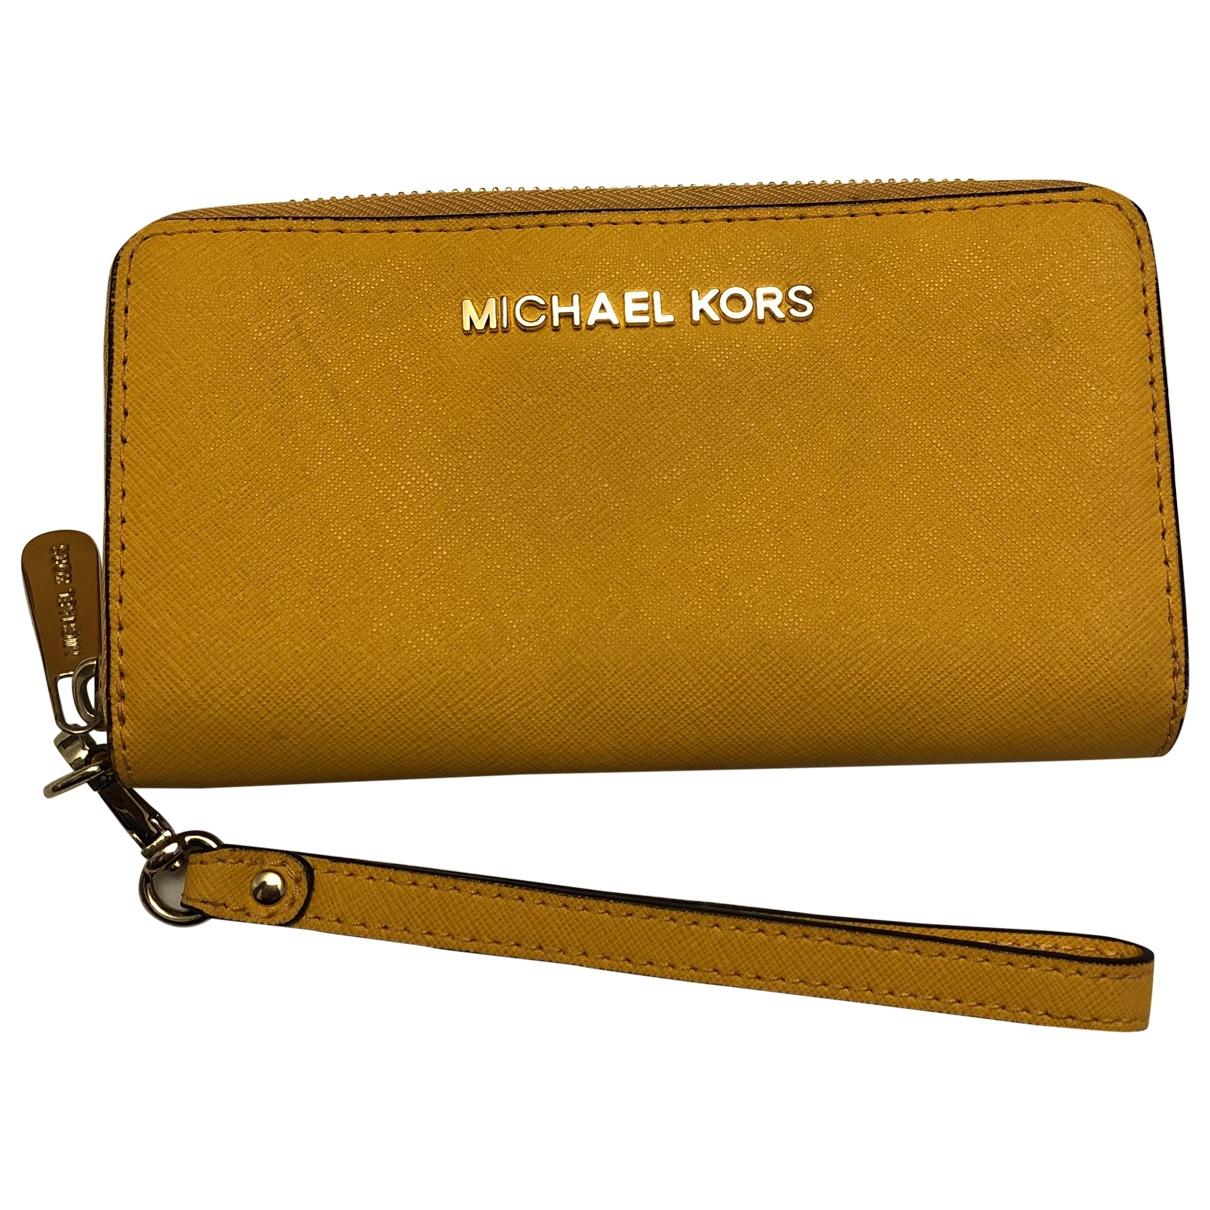 Michael Kors Jet Set Yellow Leather wallet for Women \N